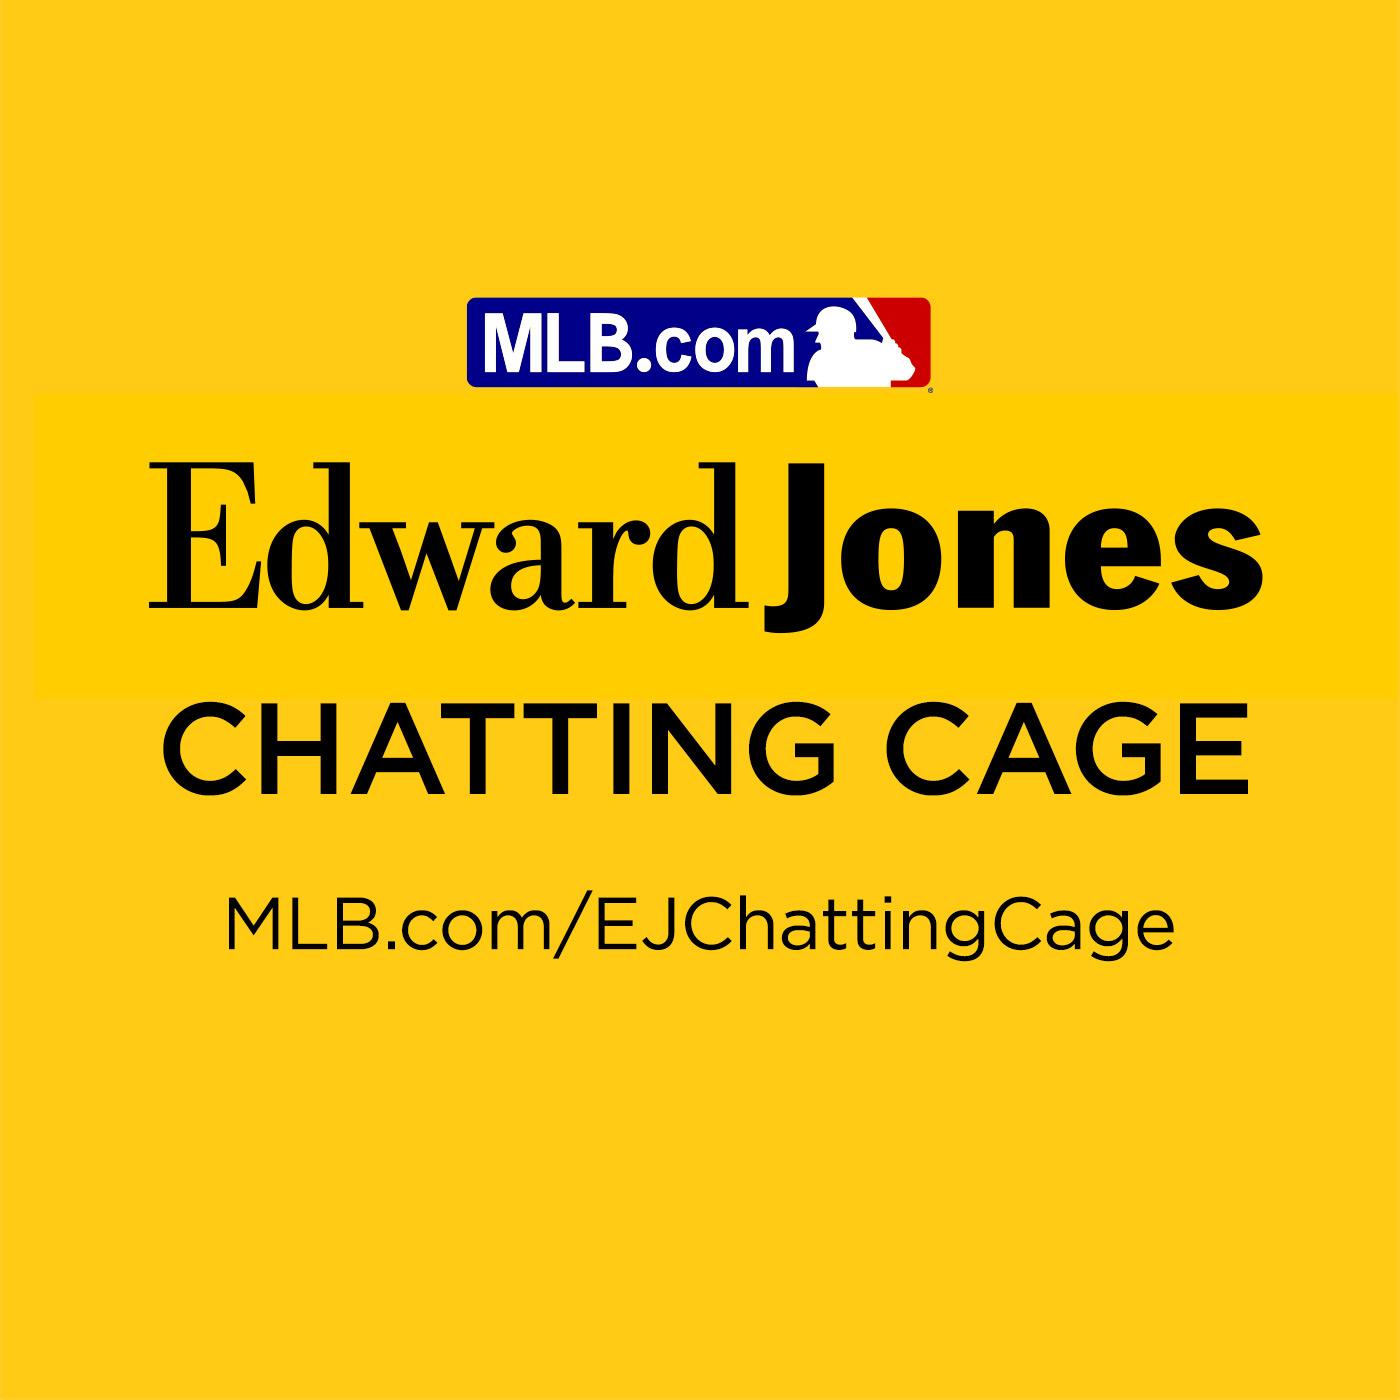 <![CDATA[MLB.com Edward Jones Chatting Cage]]>